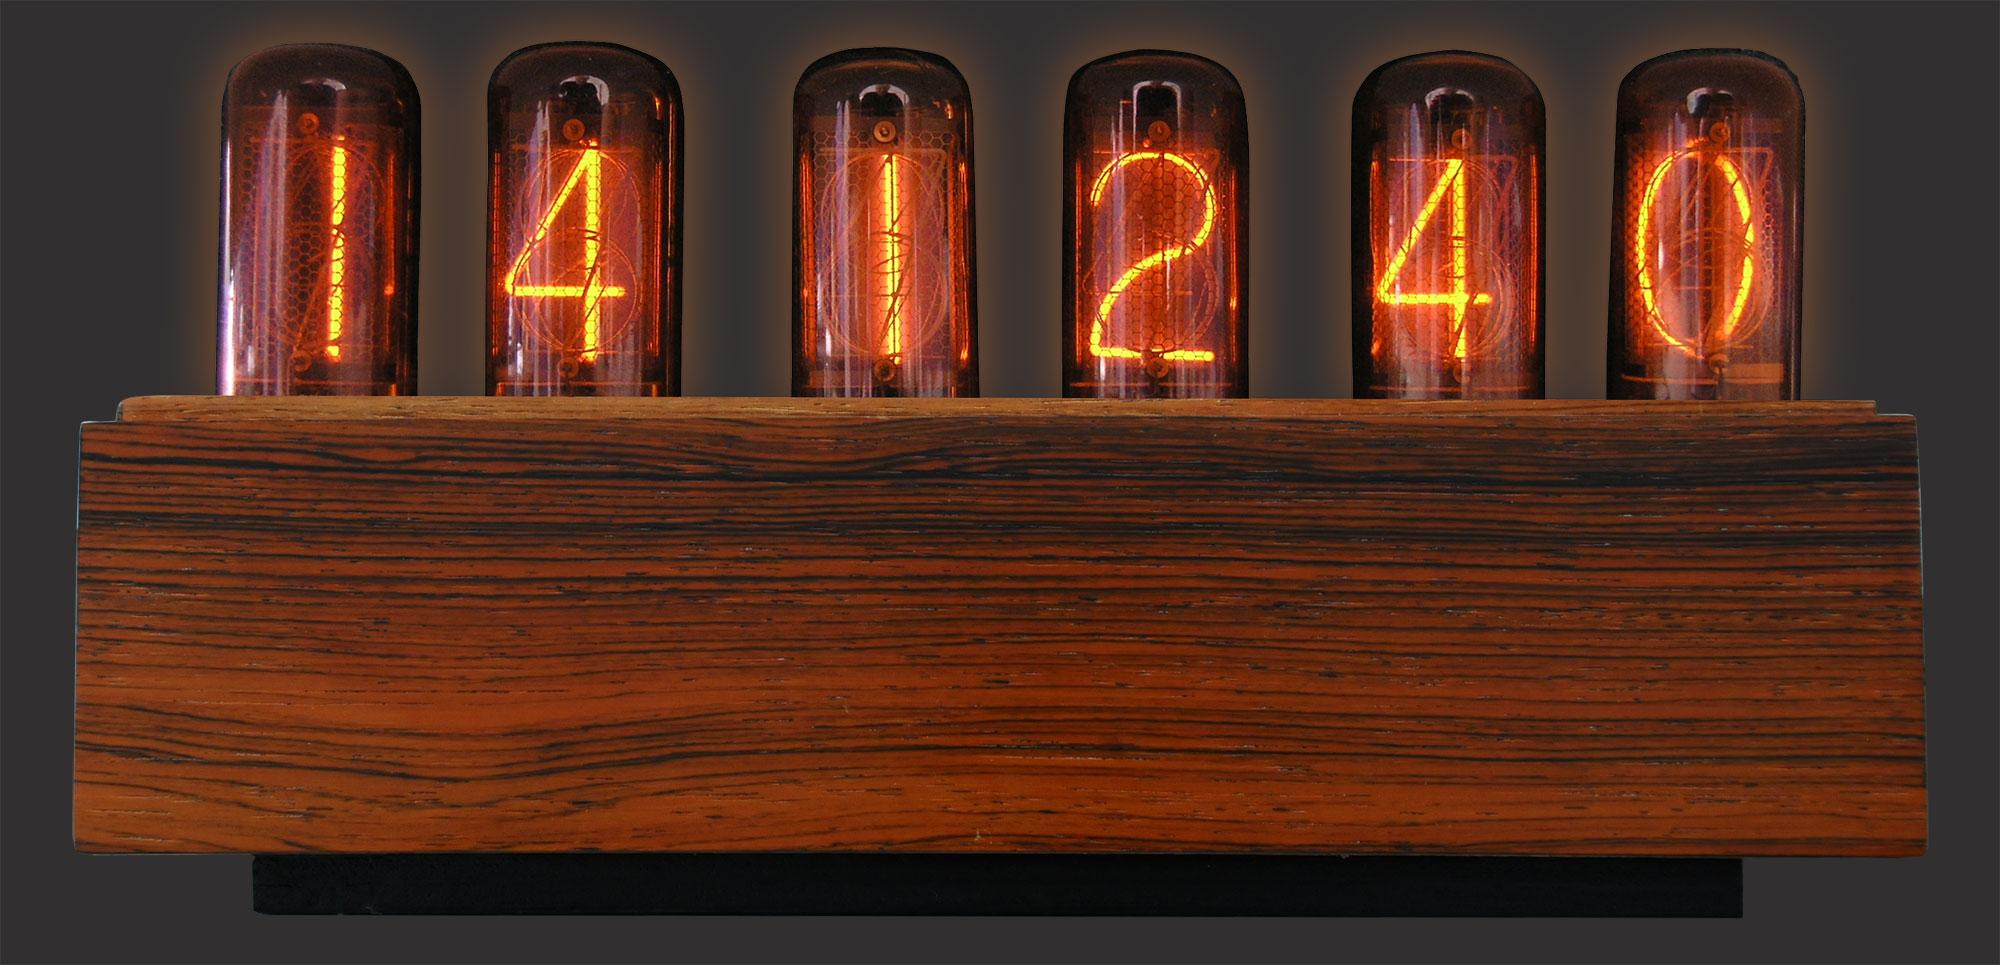 die weltweit erste ntp synchronisierte nixie tube uhr. Black Bedroom Furniture Sets. Home Design Ideas